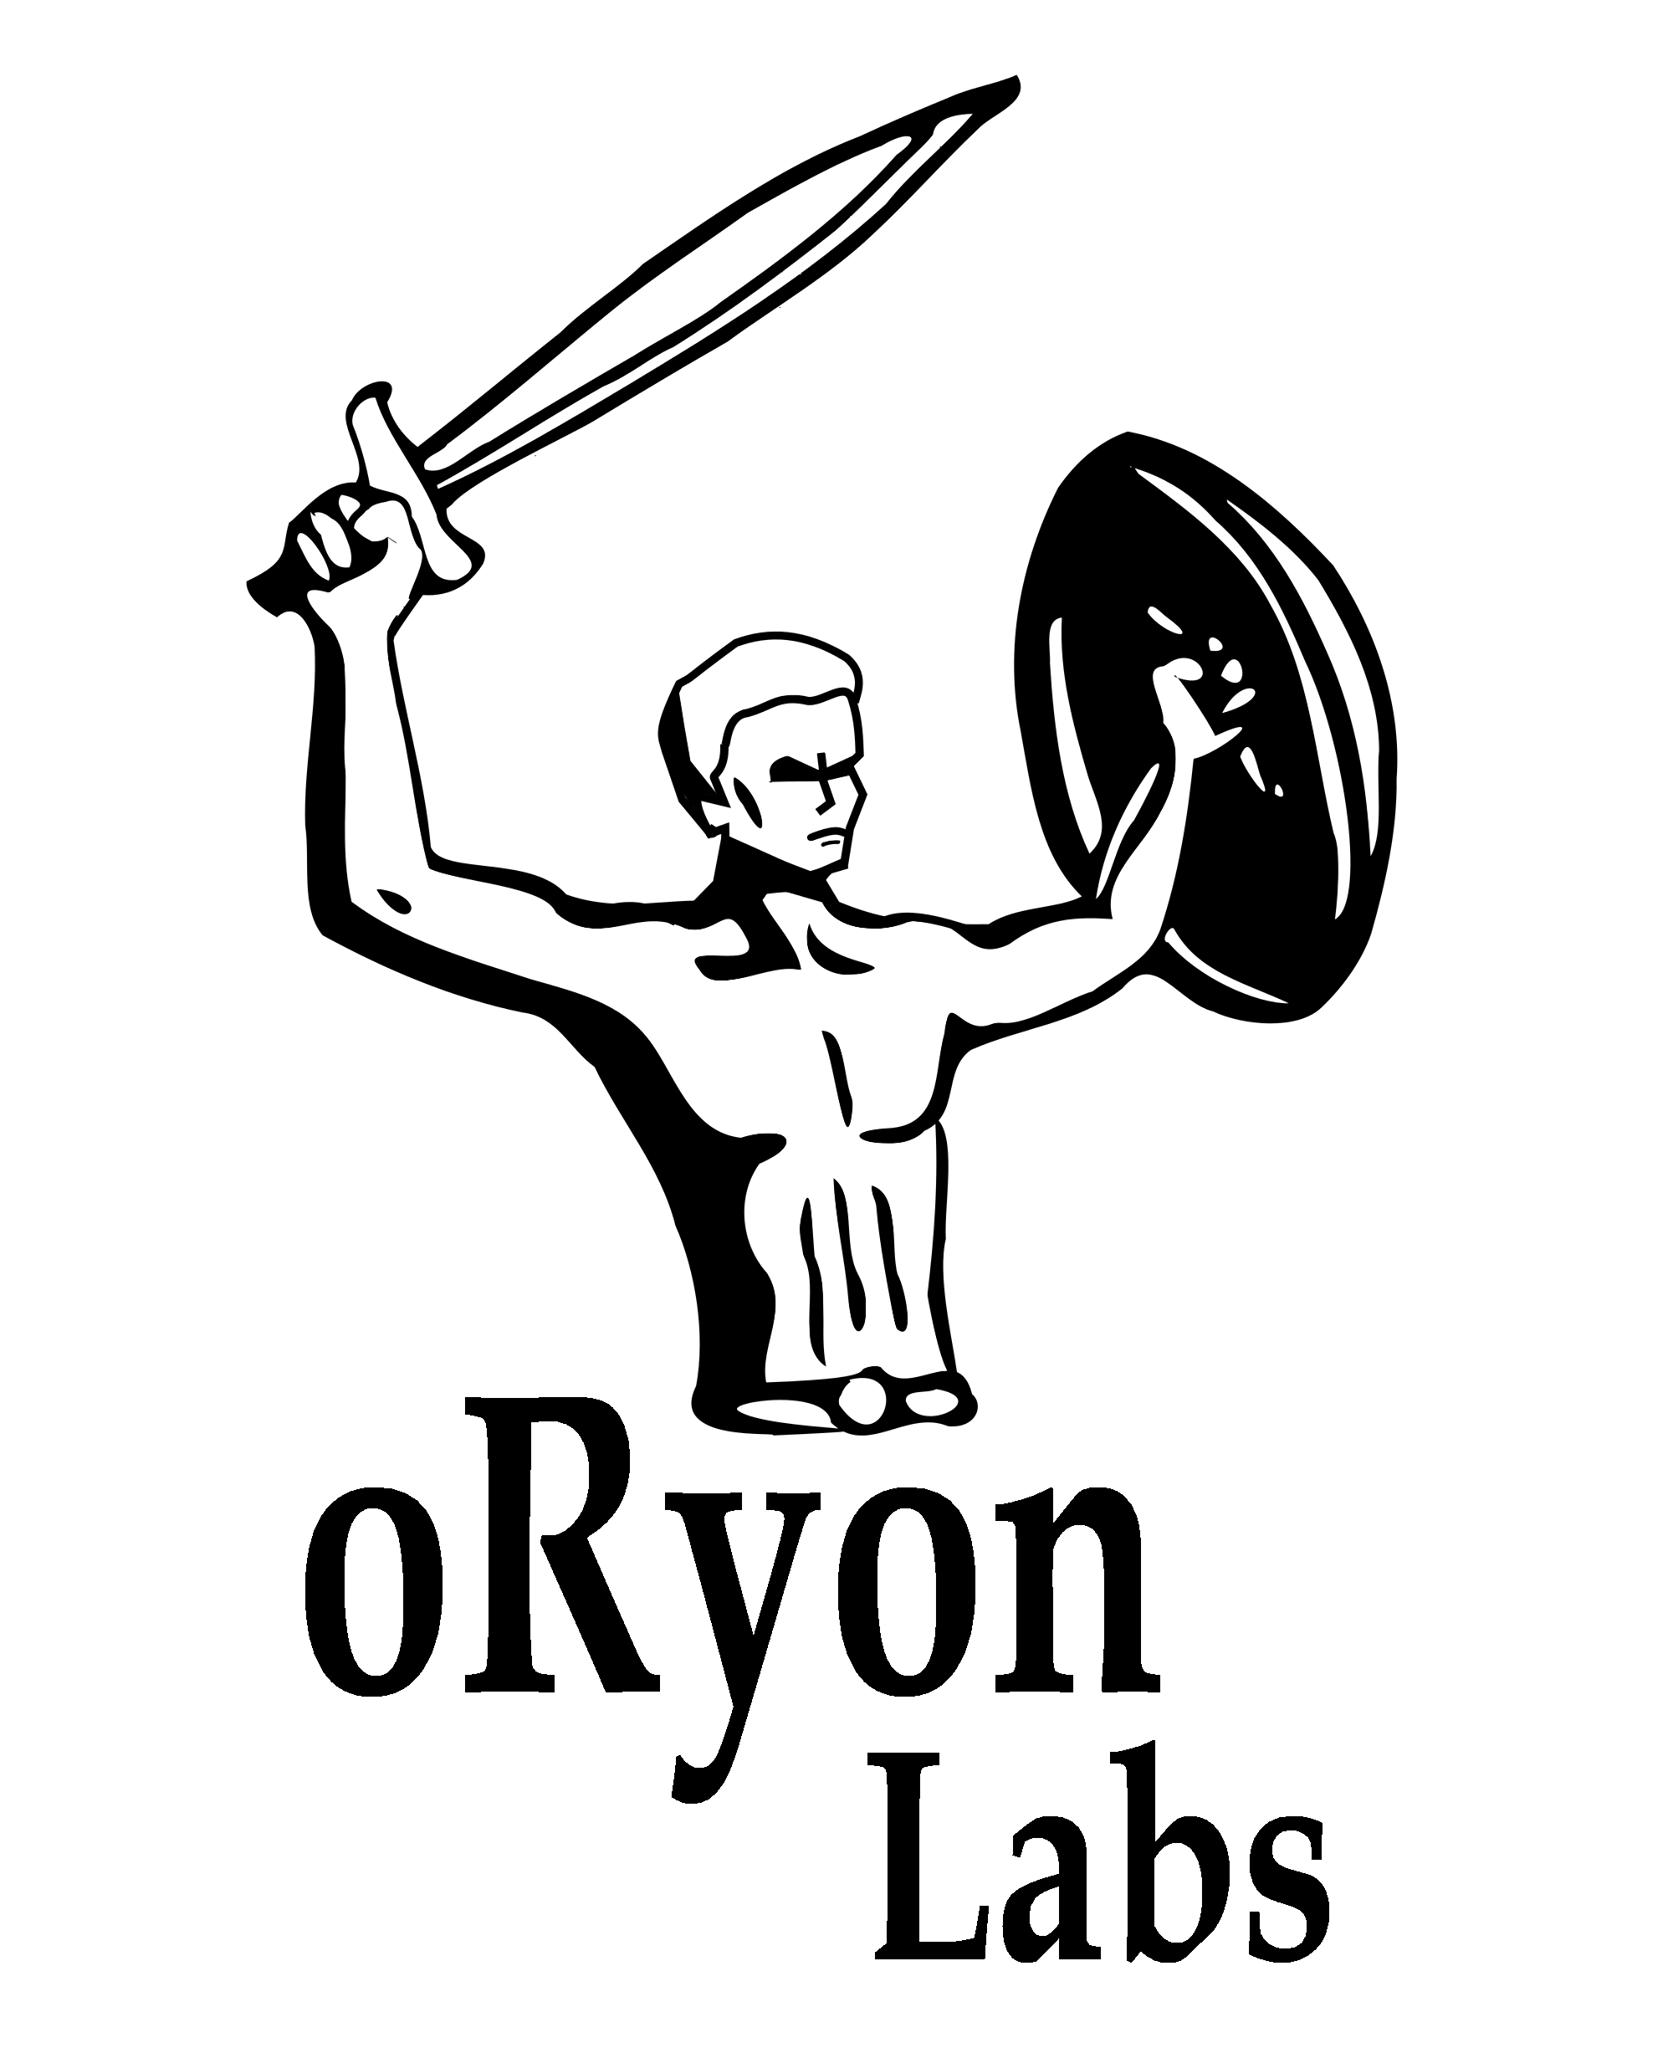 oRyon Labs Logo